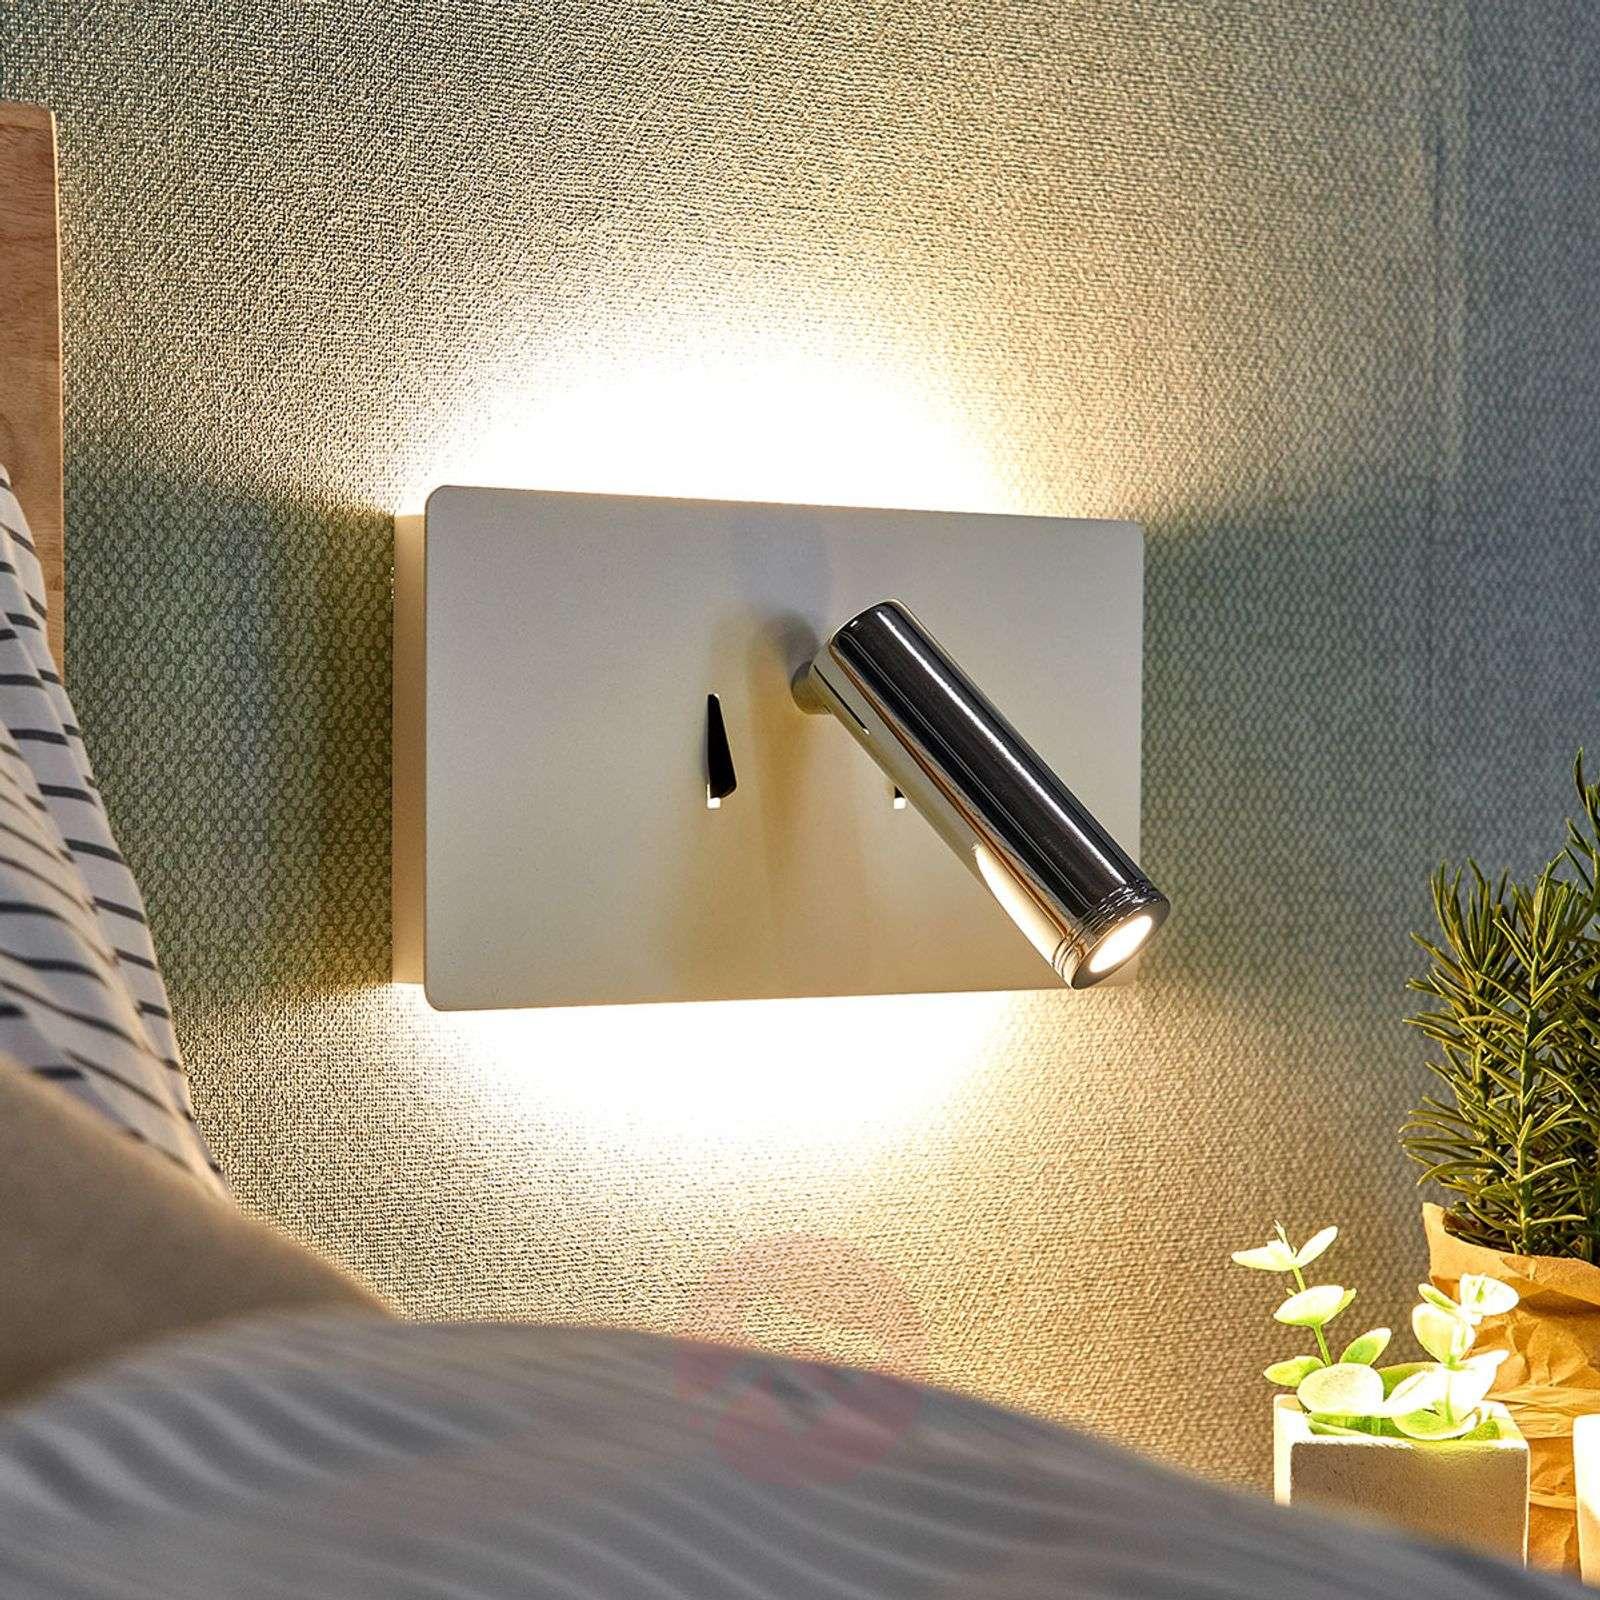 LED-seinävalaisin Elske, jossa lukuvalo-9976050-02